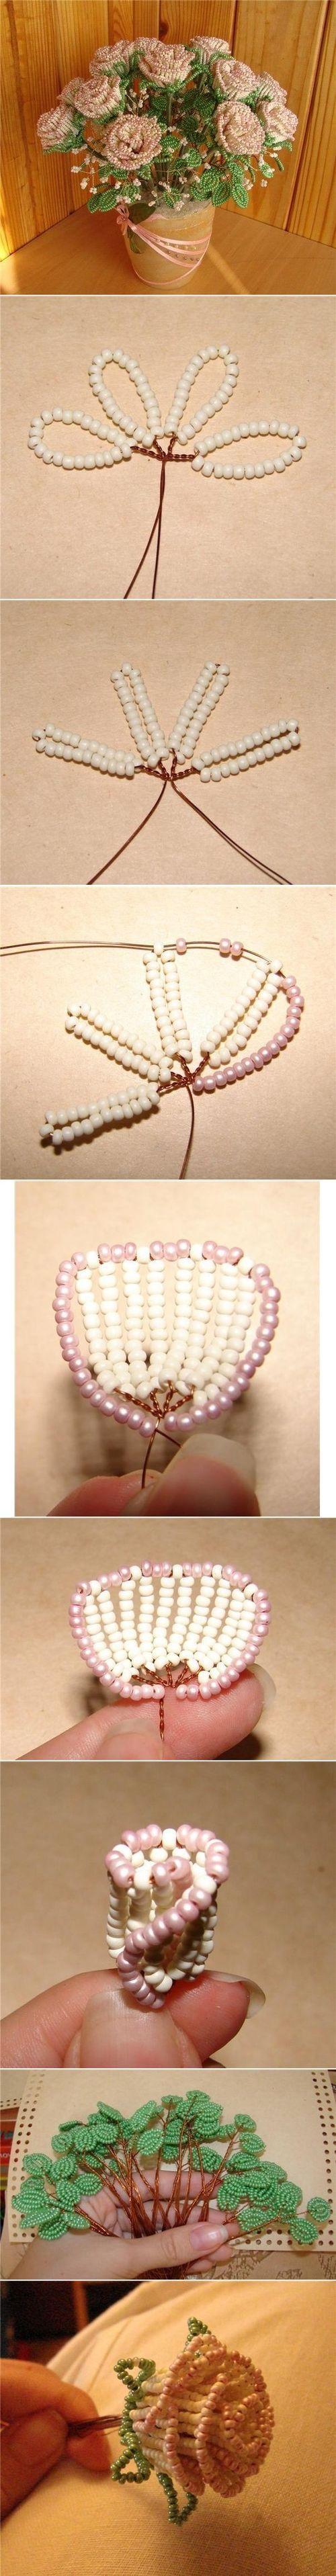 DIY Bead Roses Bouquet DIY Projects / UsefulDIY.com